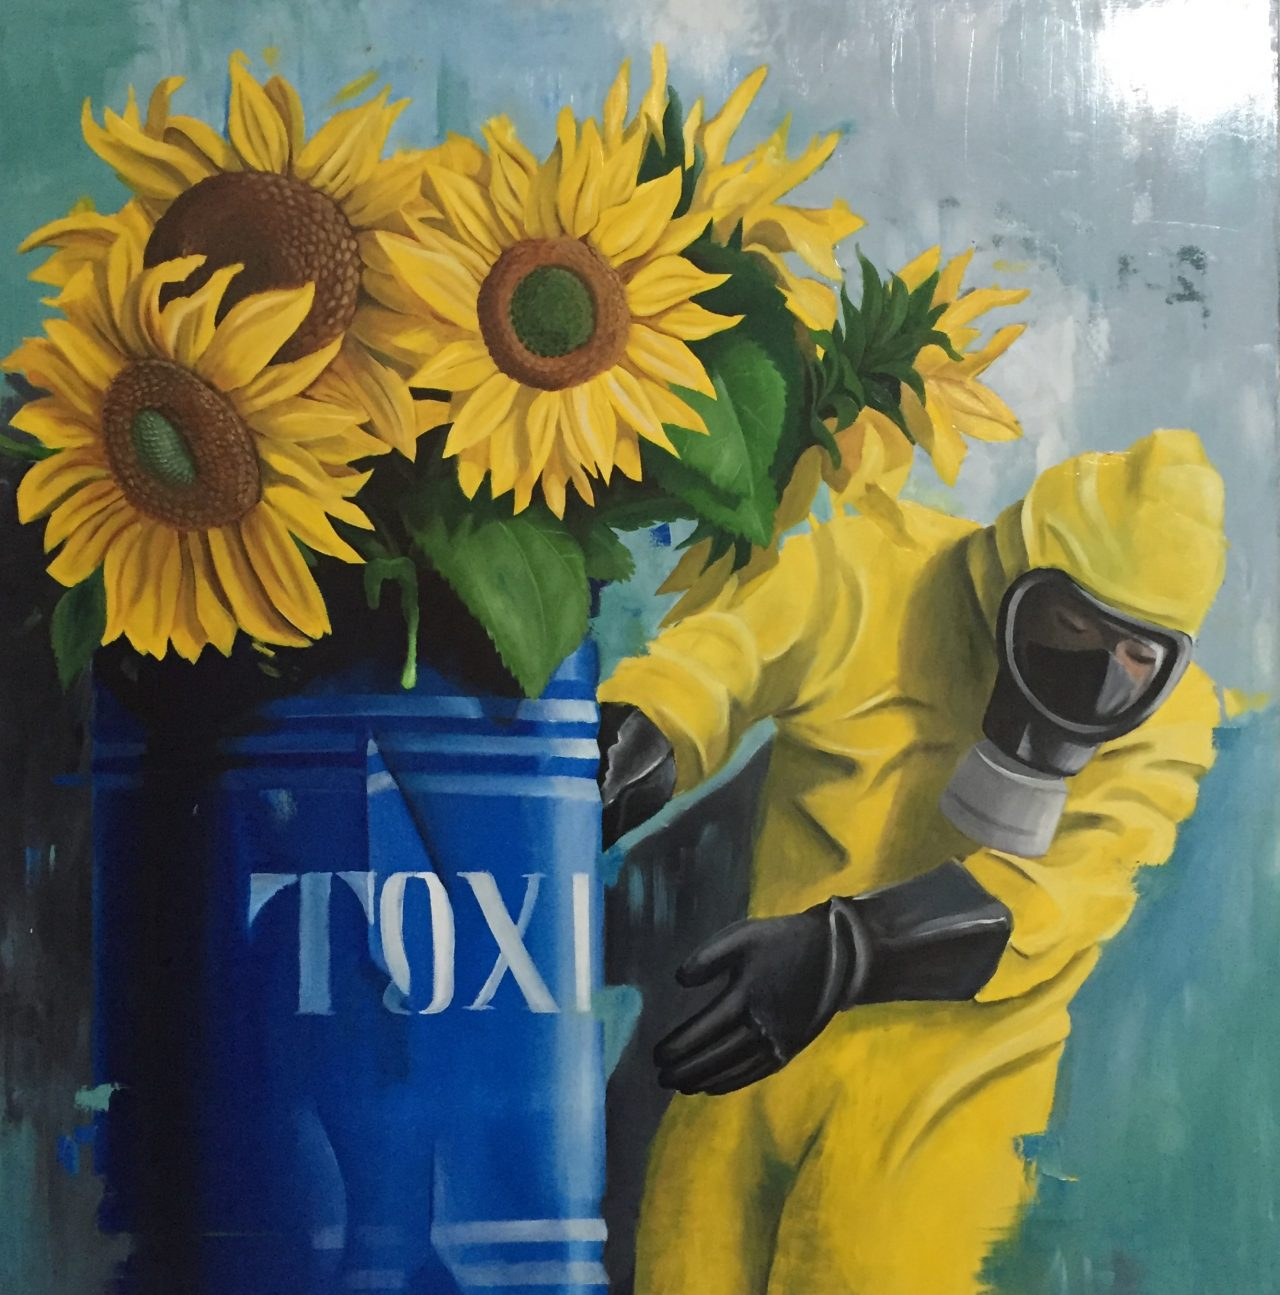 stefano-gentile-sunflowers-girasoli-pop-art-arte-nuke-toxic